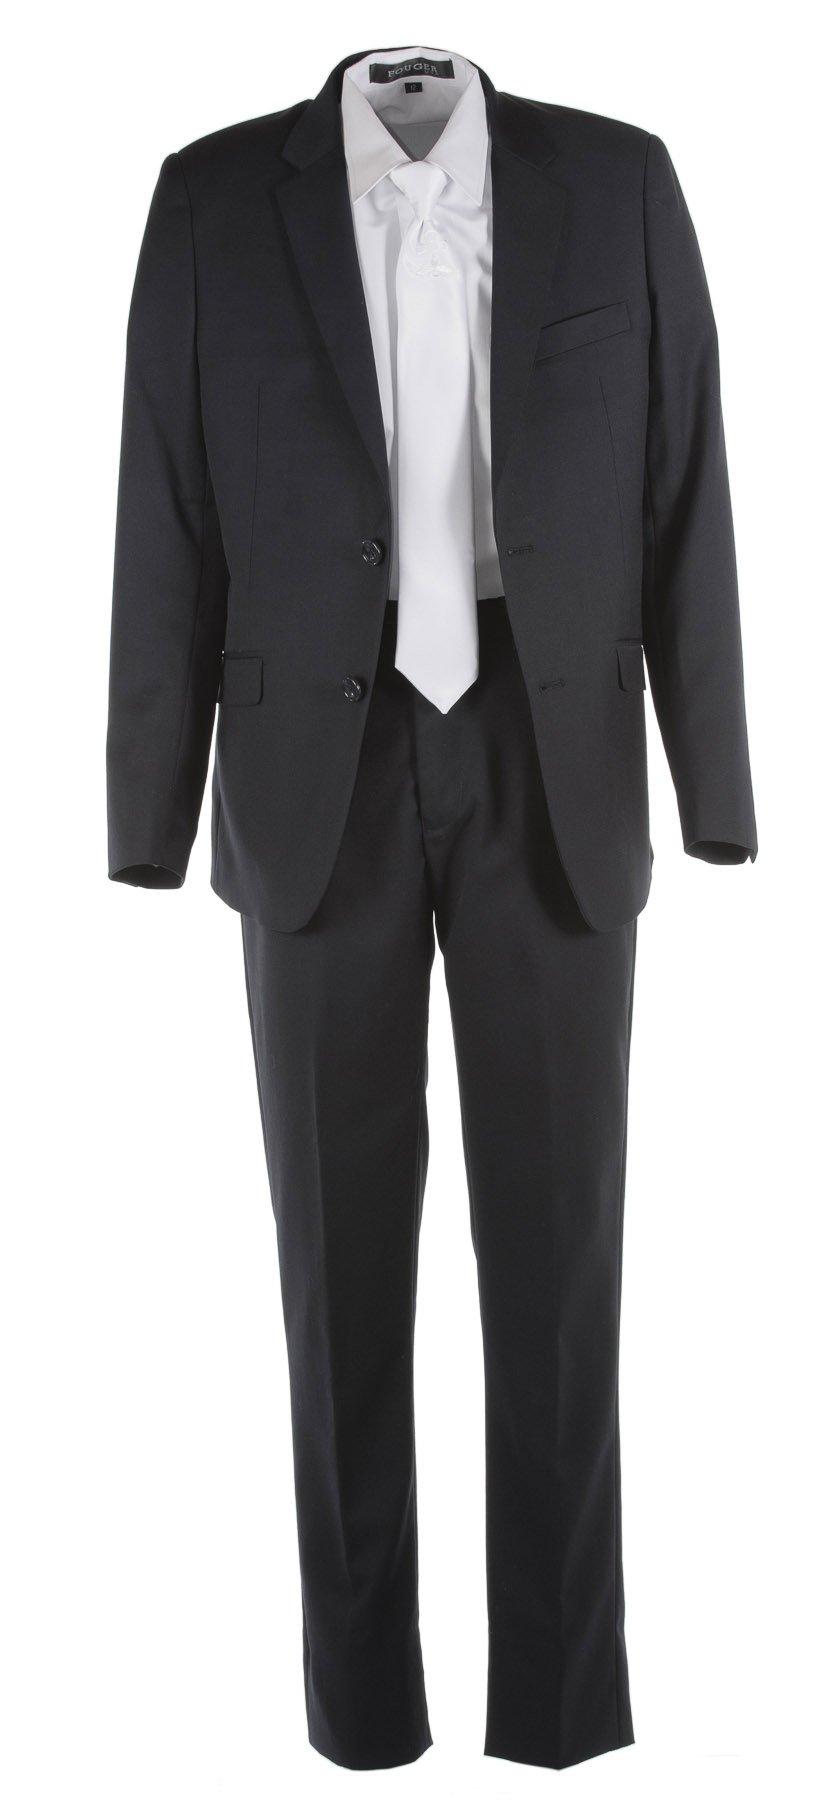 Tuxgear Boys Black Slim Fit Communion Suit With Communion Cross Dress Tie (Boys 20)